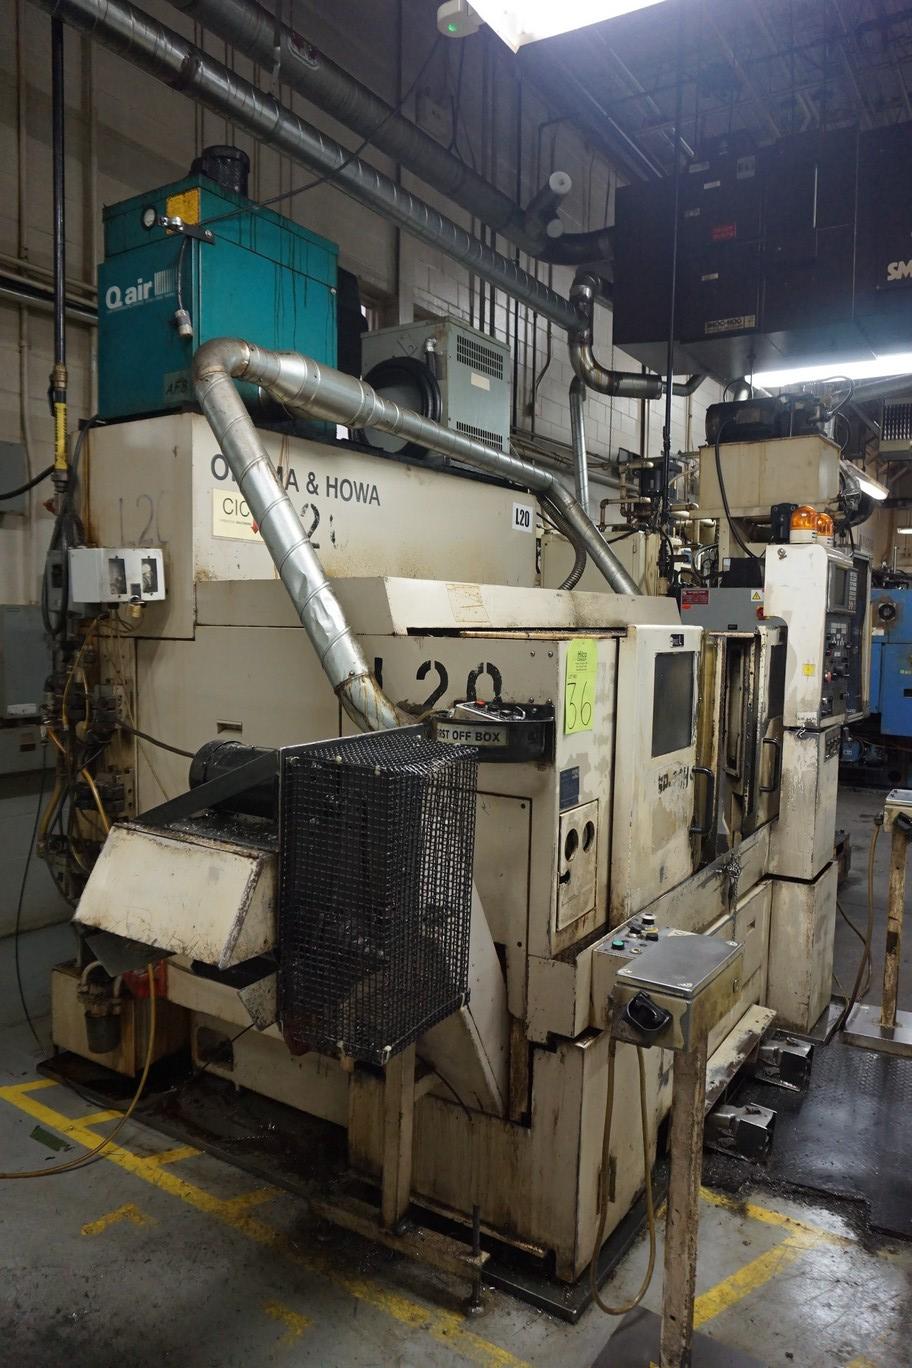 Okuma-Howa Model 2SP-20H CNC Lathe, c/w Fanuc Series 18-TT Controller, Chip Conveyor, Transformer - Image 5 of 7